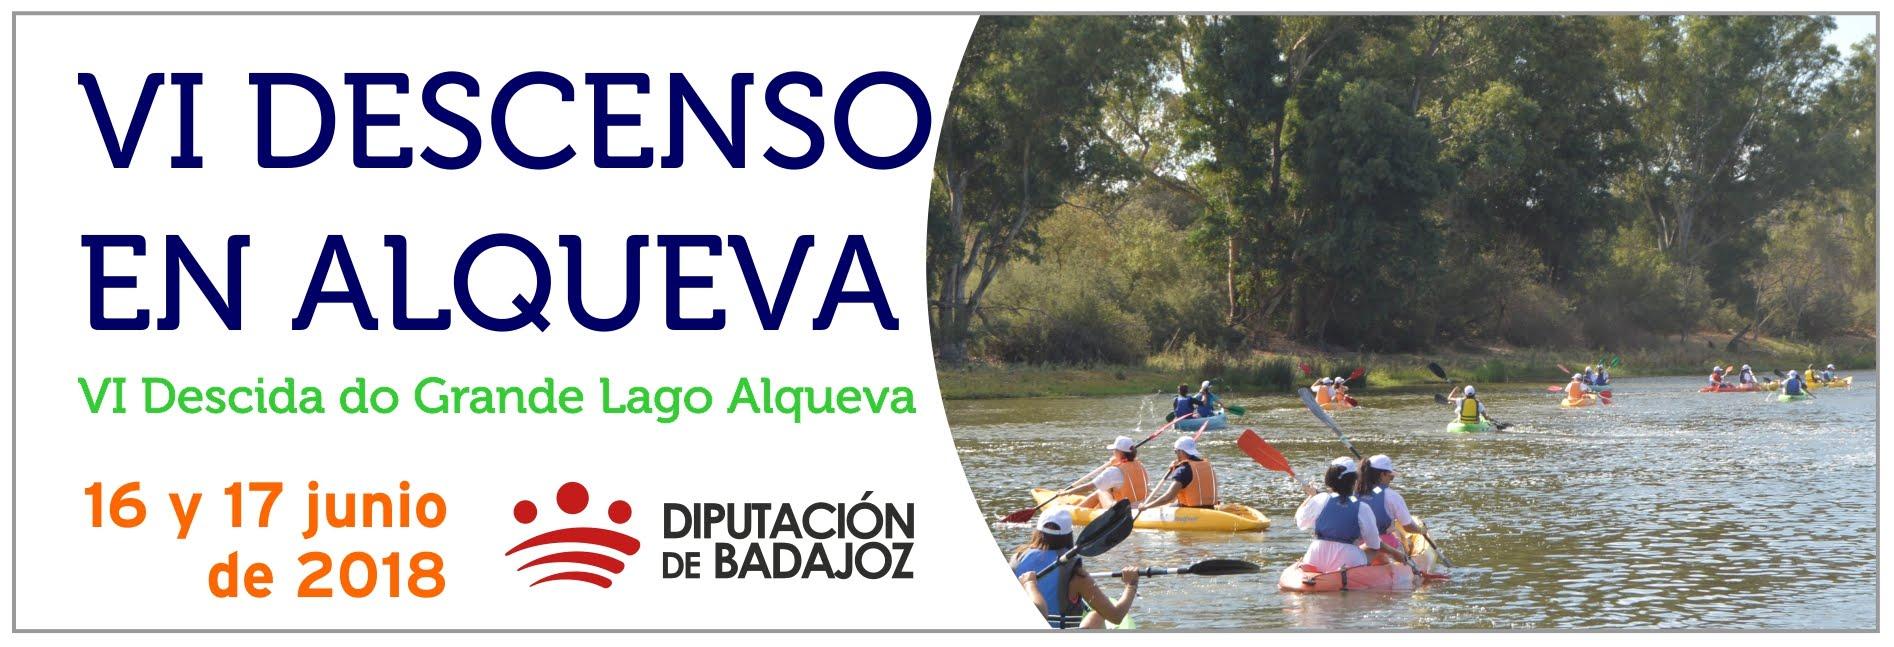 https://sites.google.com/a/alcorextremadura.org/www/eventos-y-promocion/descenso-alqueva/Logo_Descenso2018web.jpg